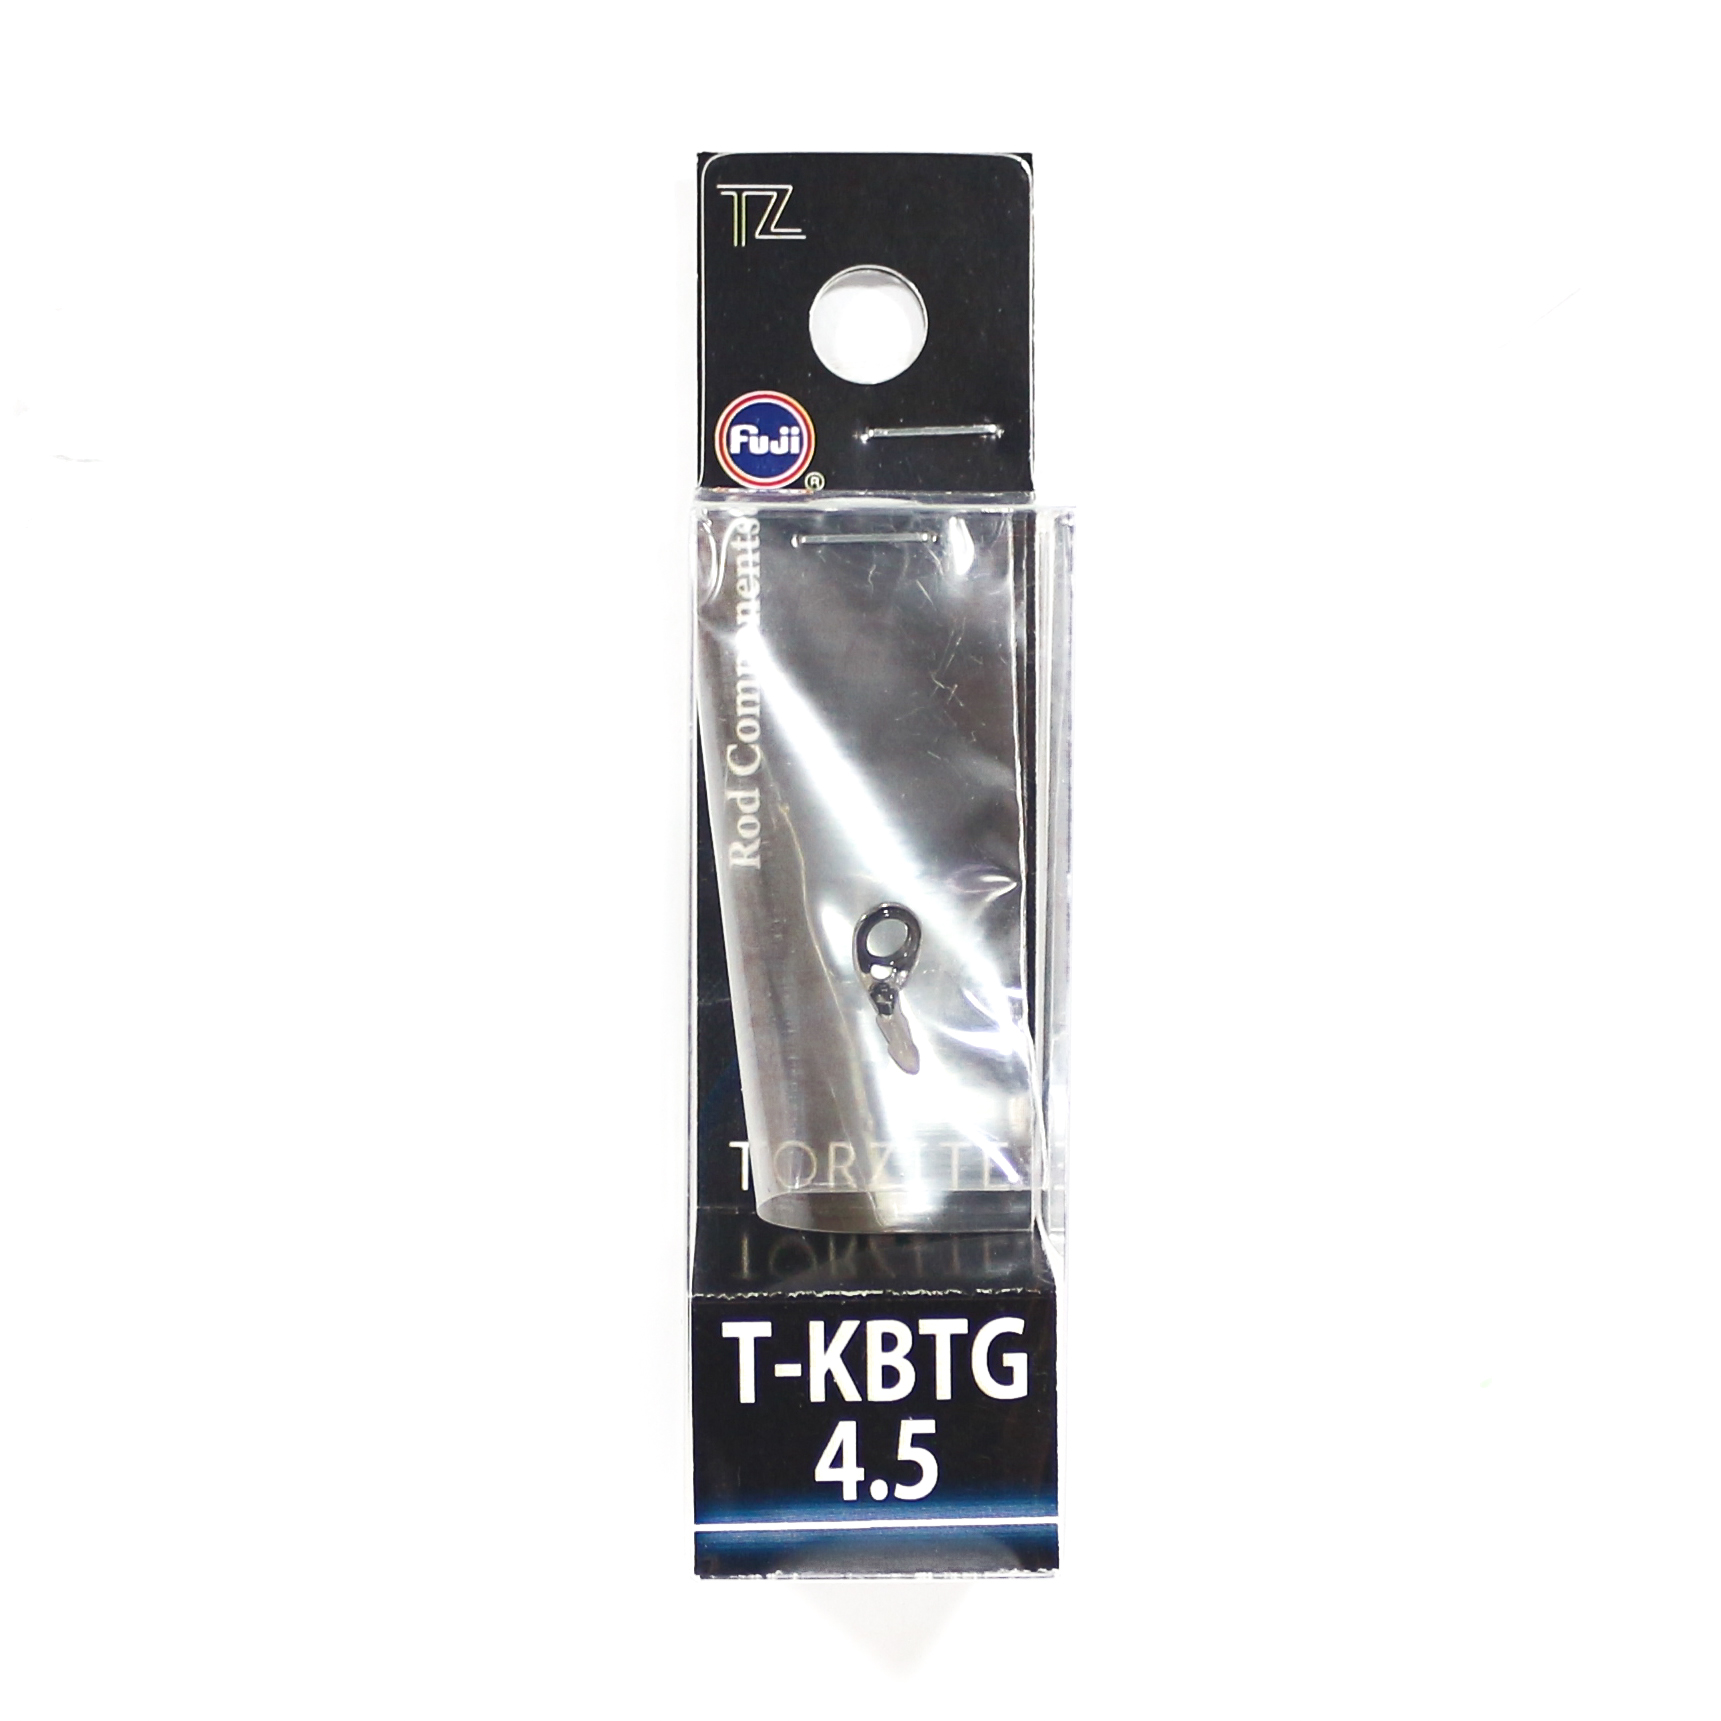 Fuji T-KBTG Size 4.5 Rod Guide Torzite Titanium Frame x 1 piece (3107)